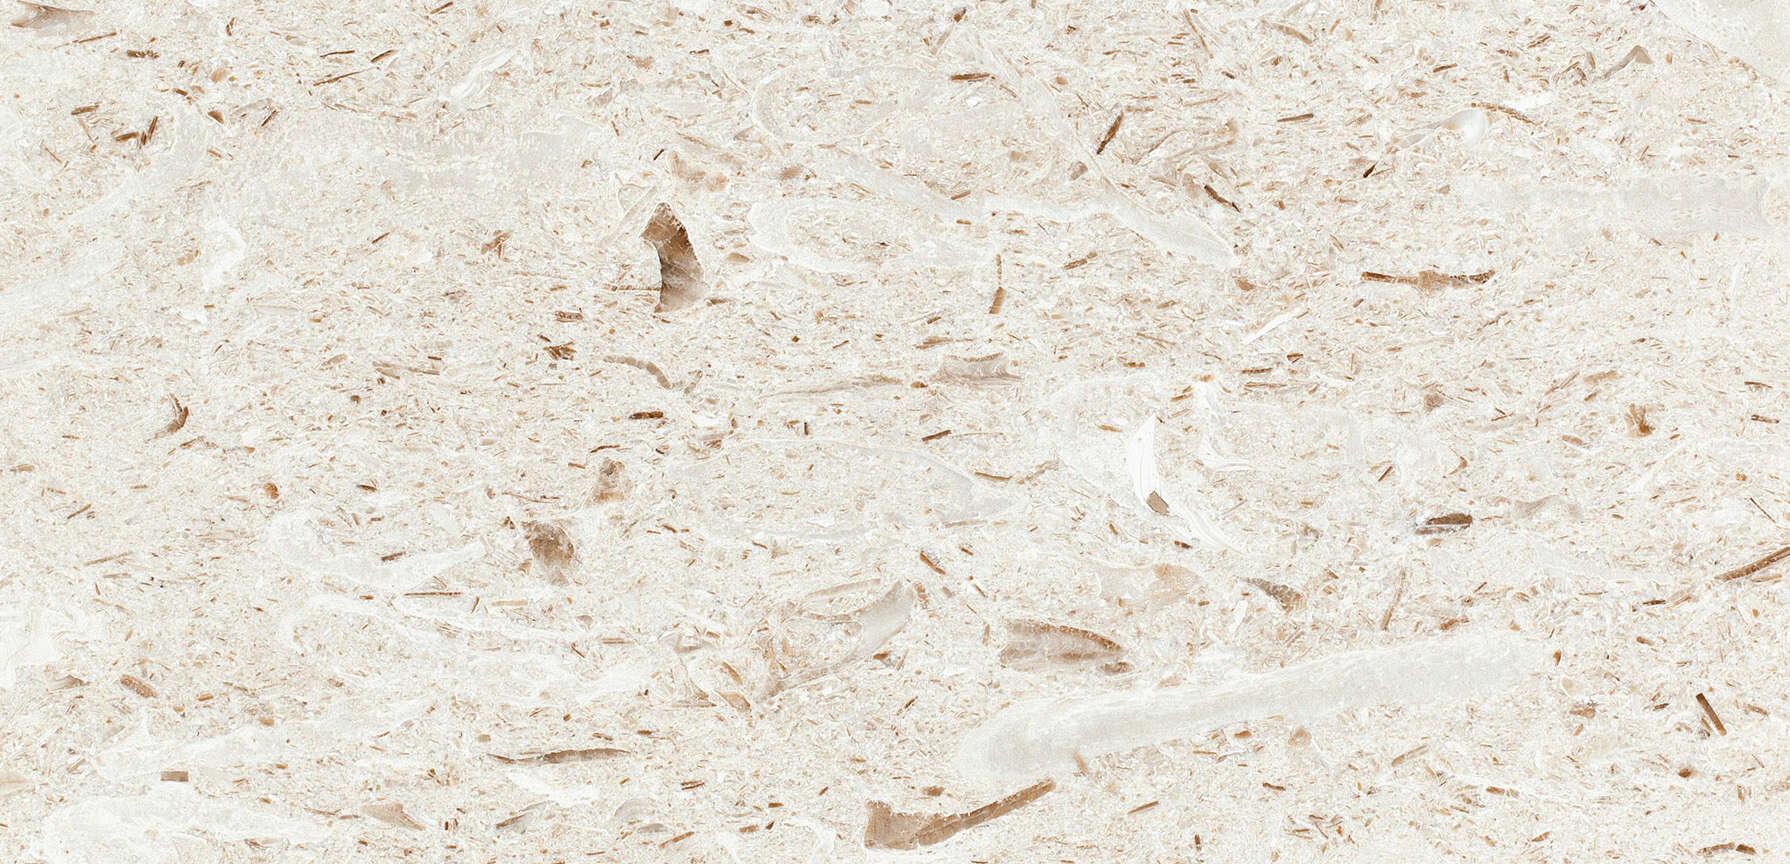 Caliza-turca-recife-fossil-myra-beige-marmol.jpg